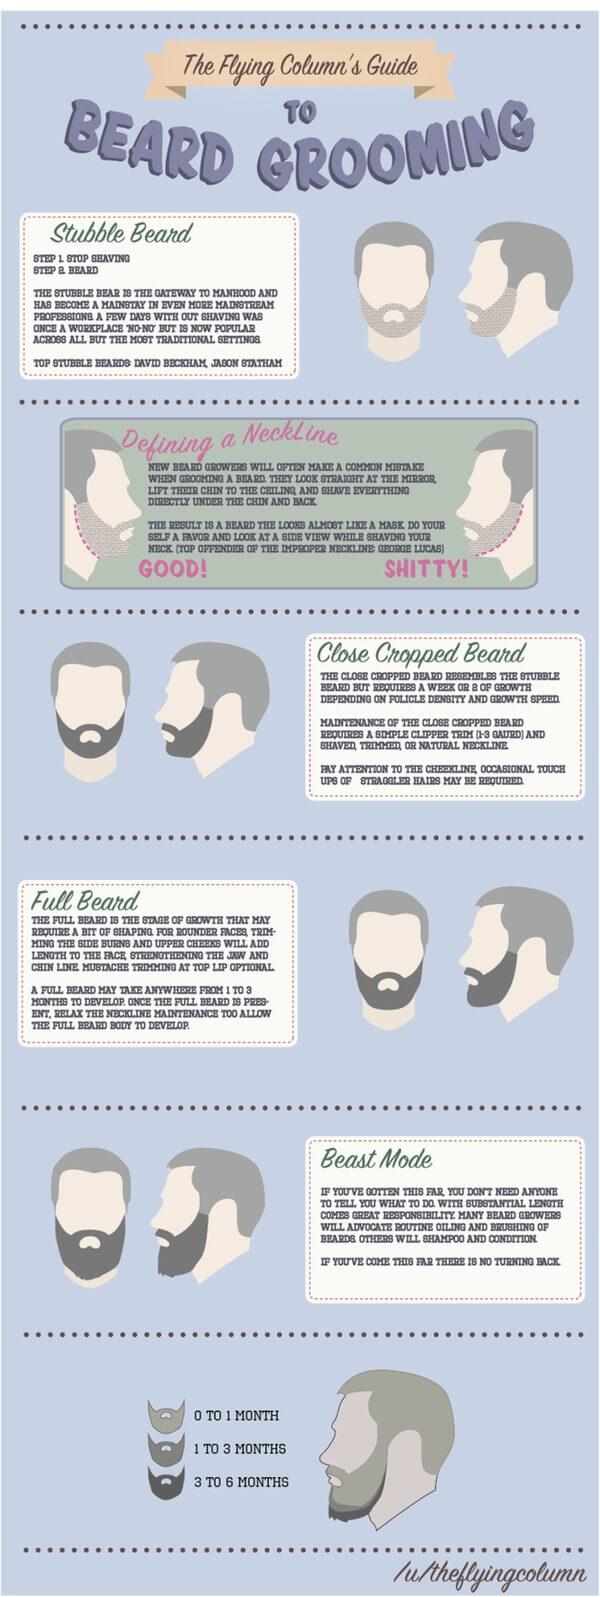 men grooming tips 7